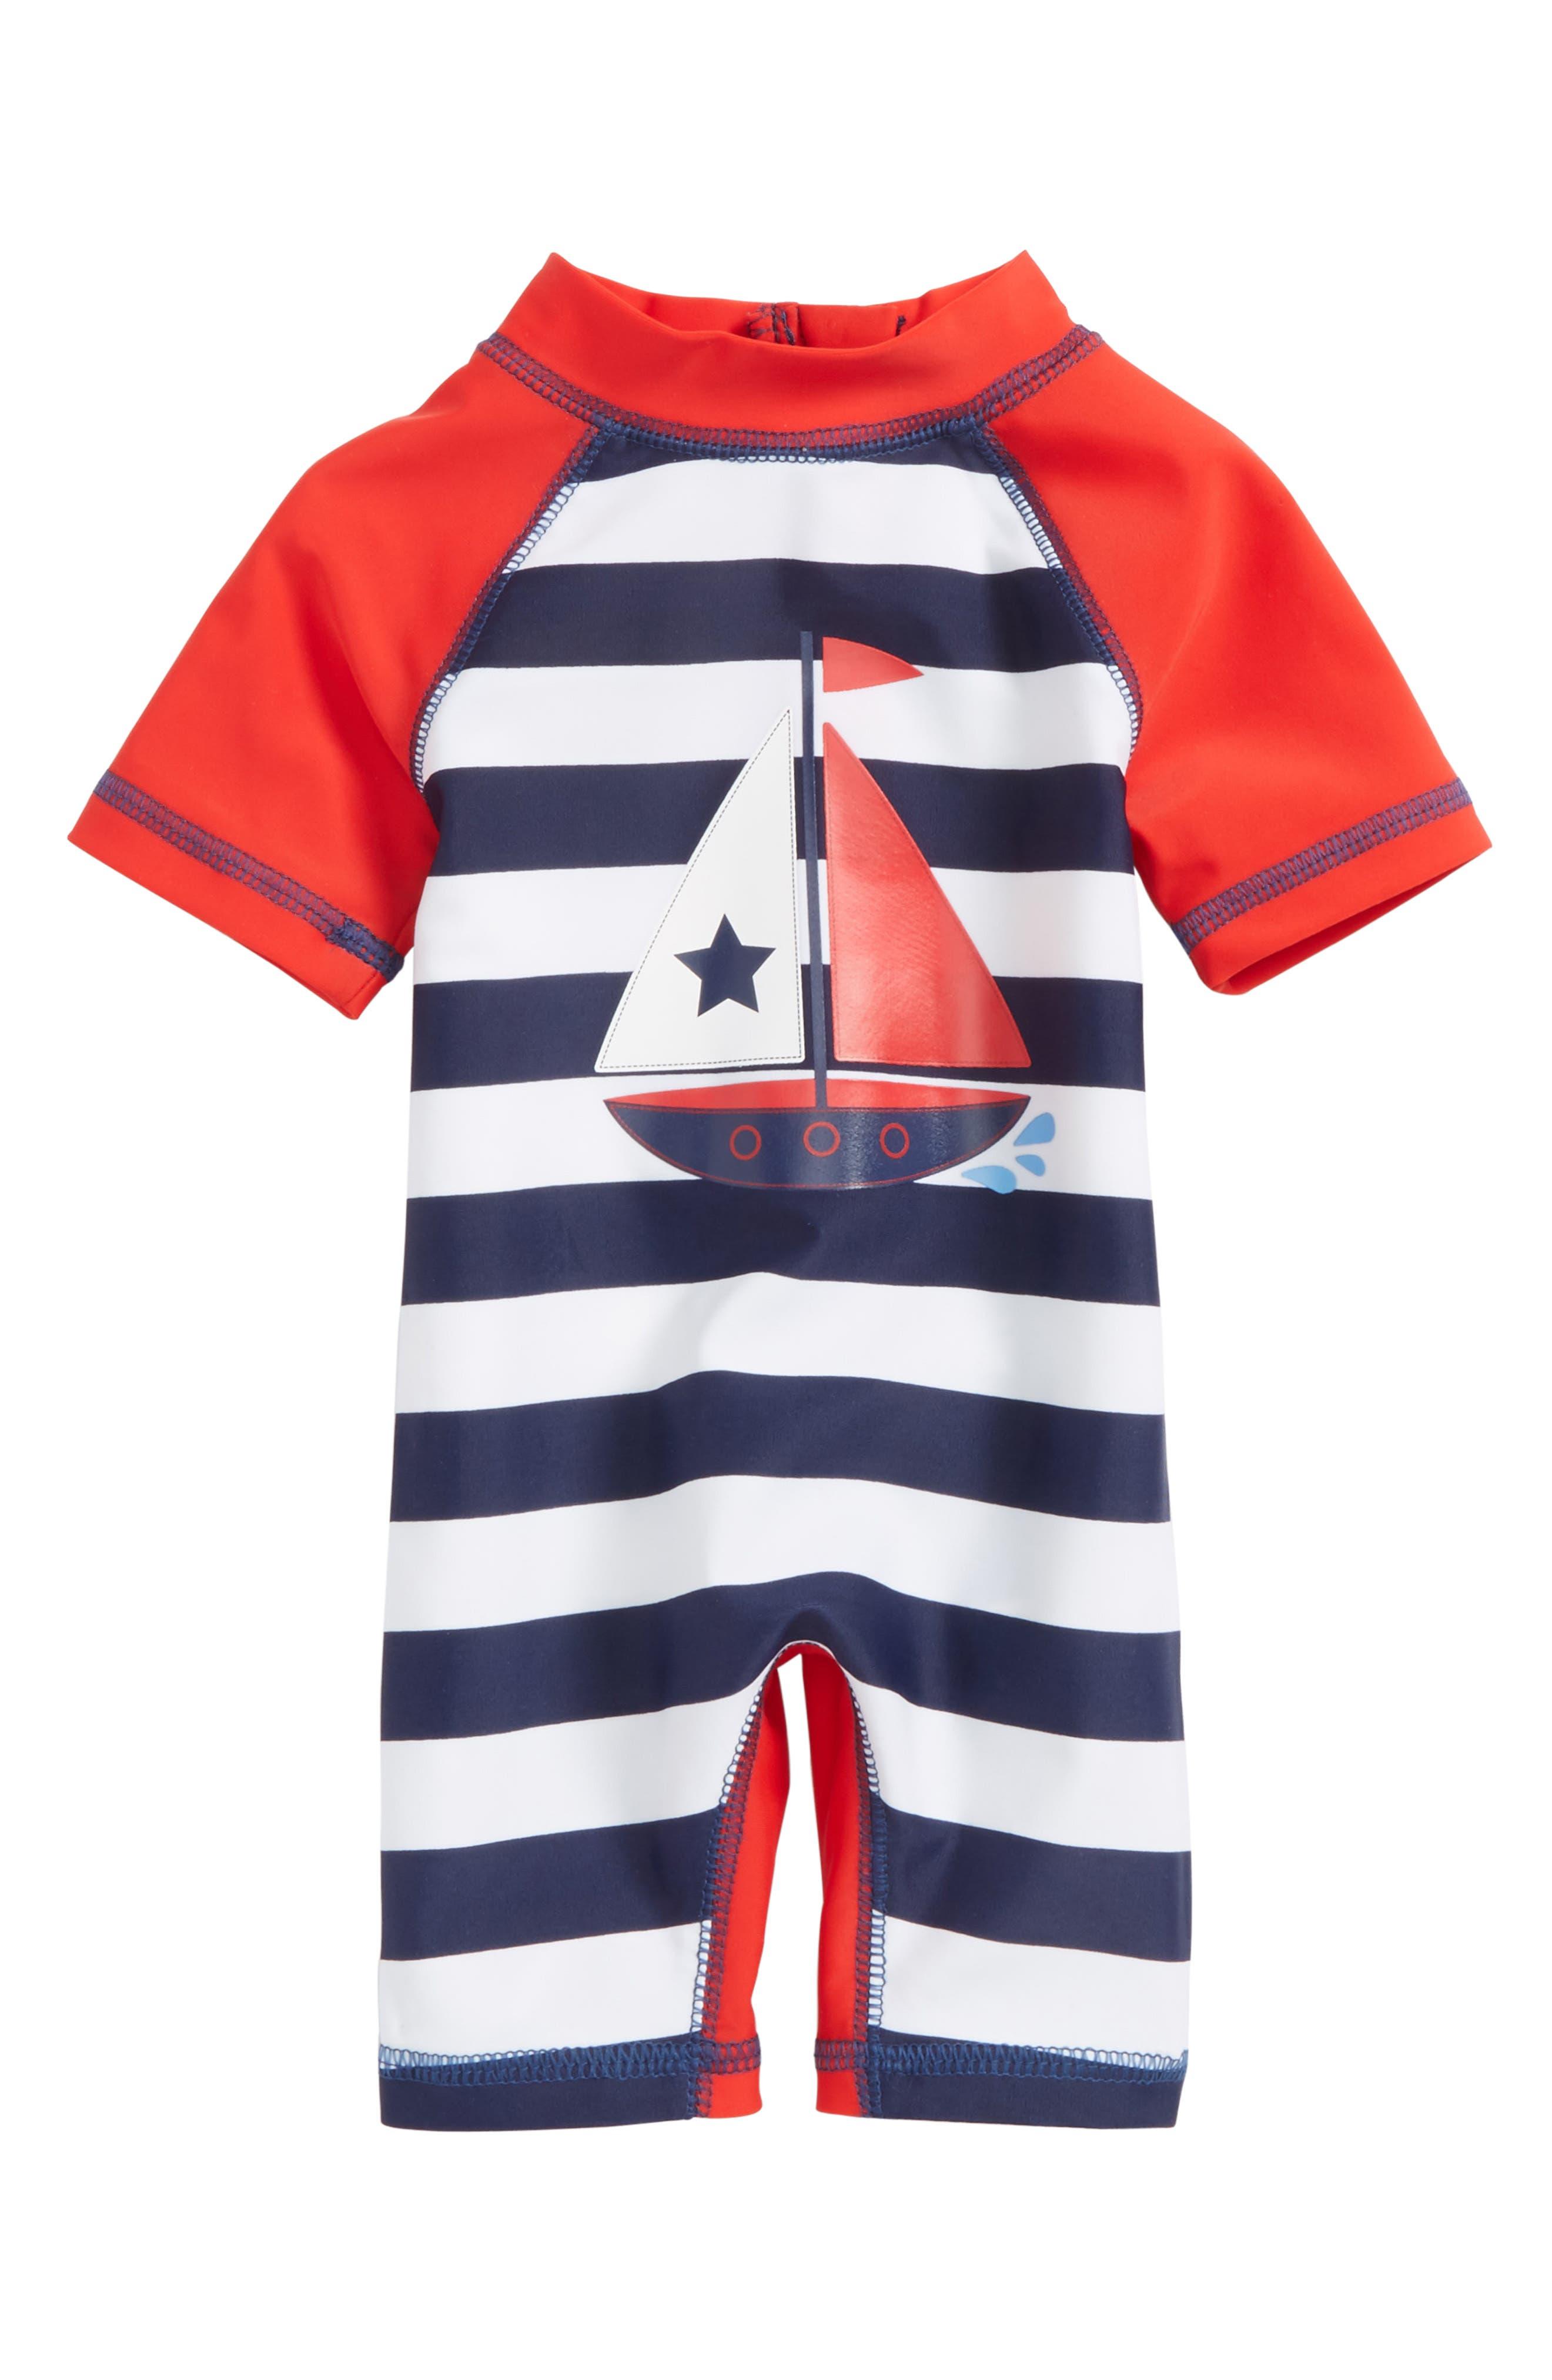 Sailboat UPF 50+ One-Piece Rashguard Swimsuit,                             Main thumbnail 1, color,                             Navy/ White